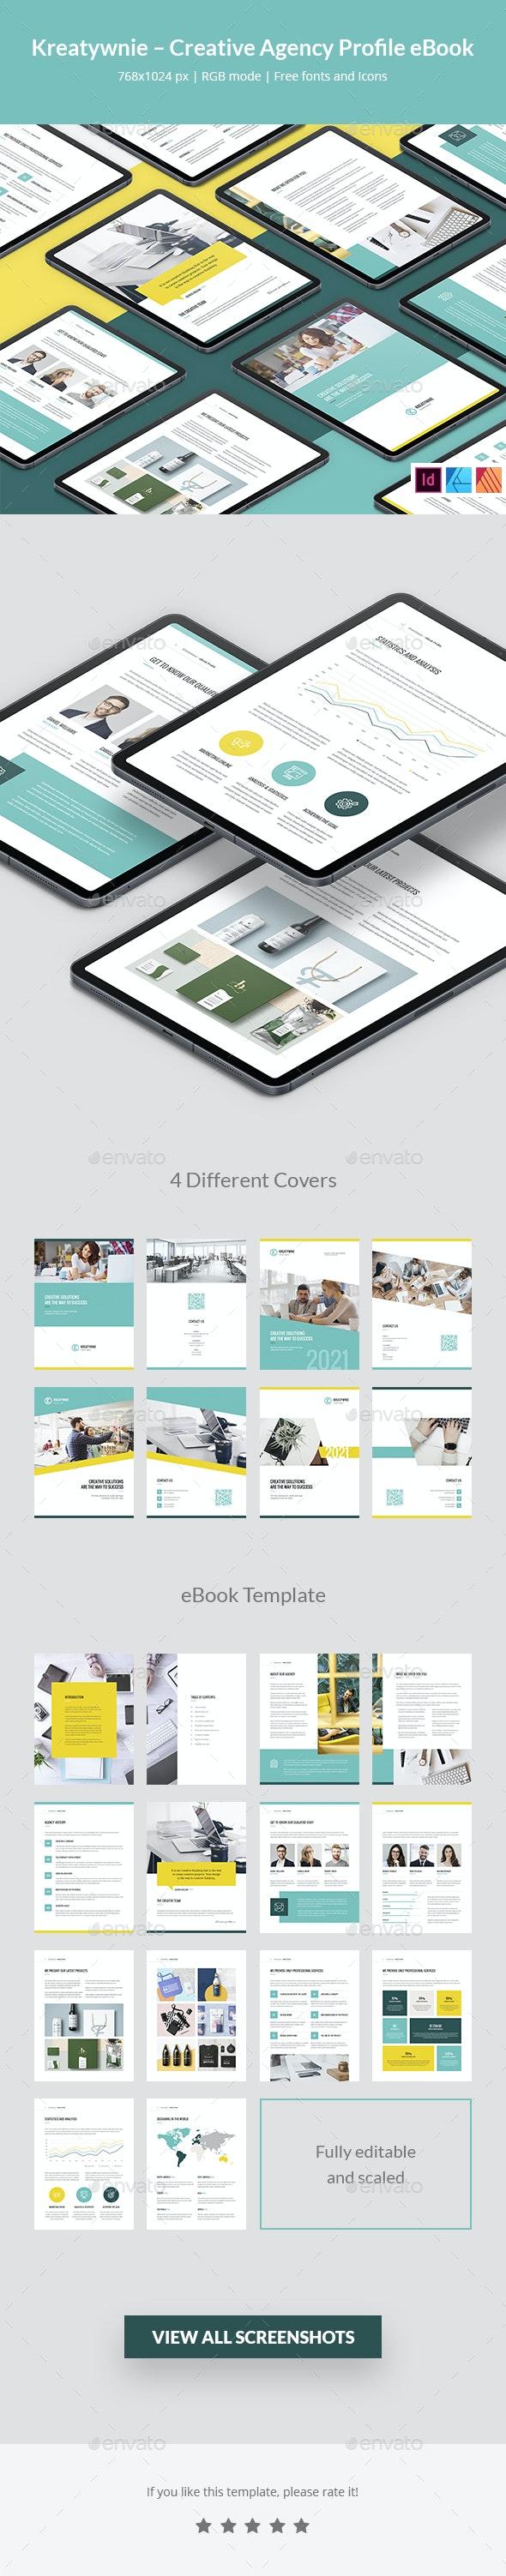 Kreatywnie – Creative Agency Profile eBook - Digital Books ePublishing